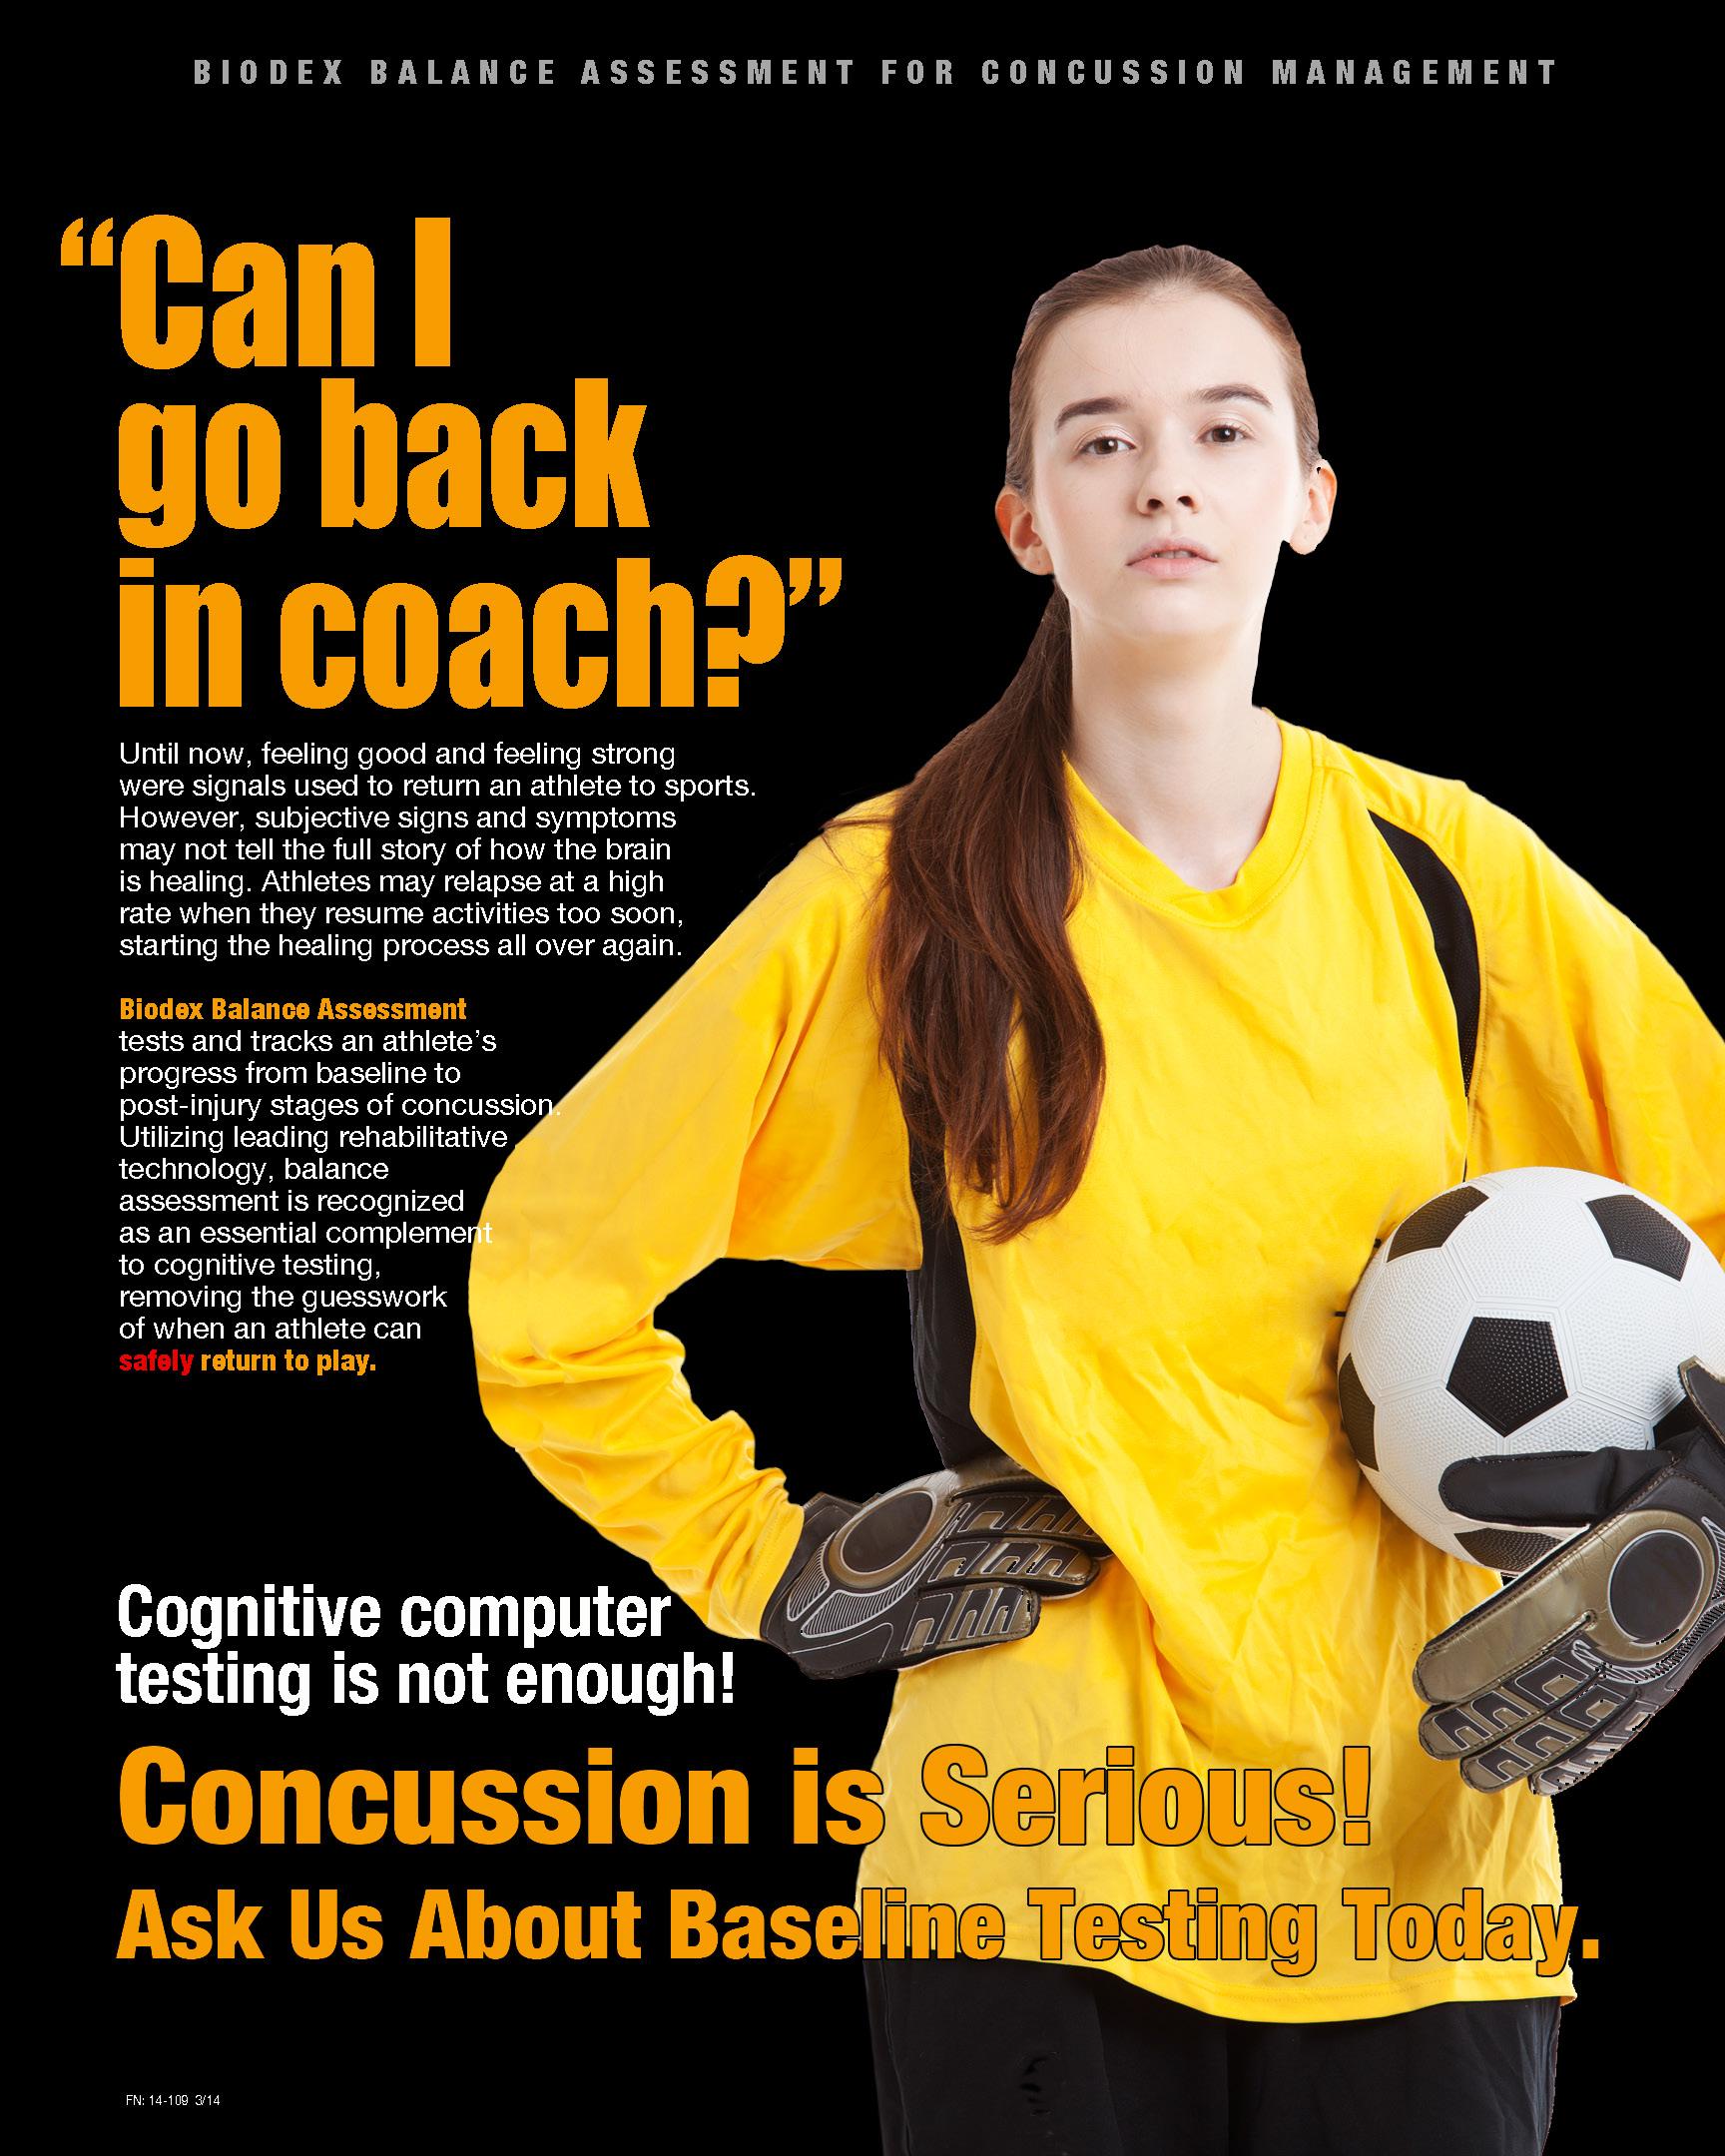 Biodex concussion soccer poster.jpg